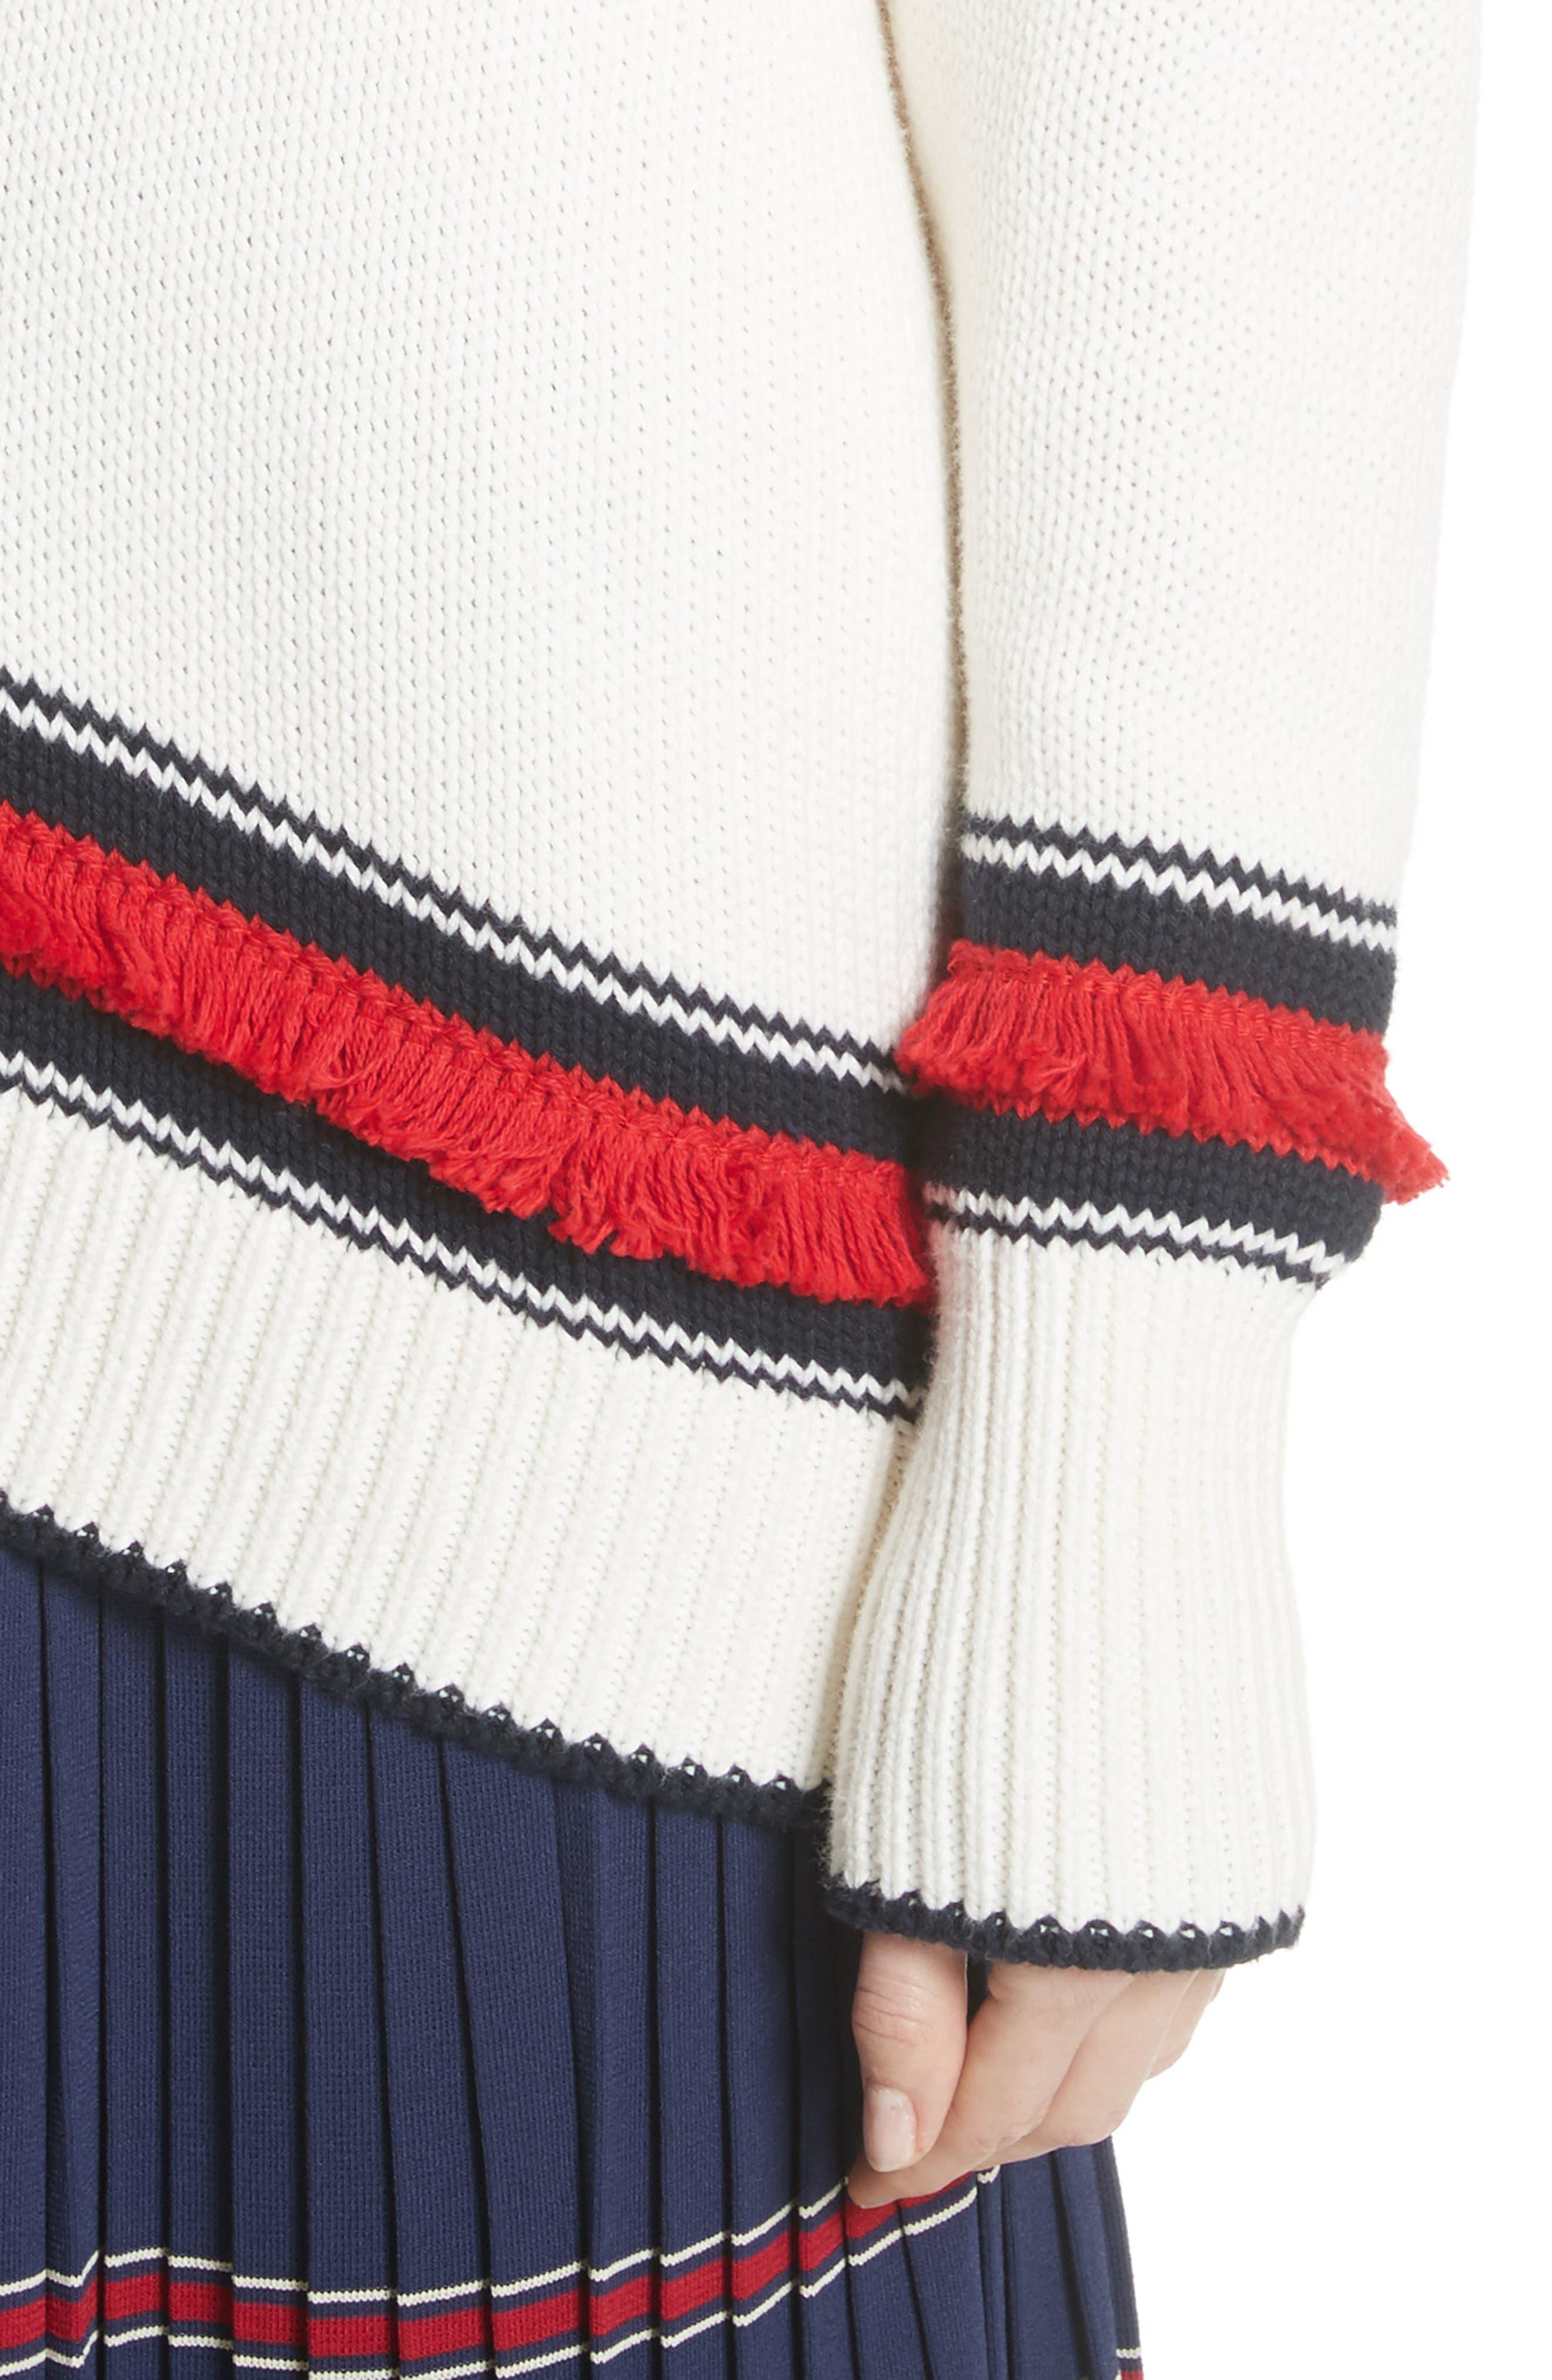 V-Neck Cotton & Cashmere Sweater,                             Alternate thumbnail 4, color,                             Ecru